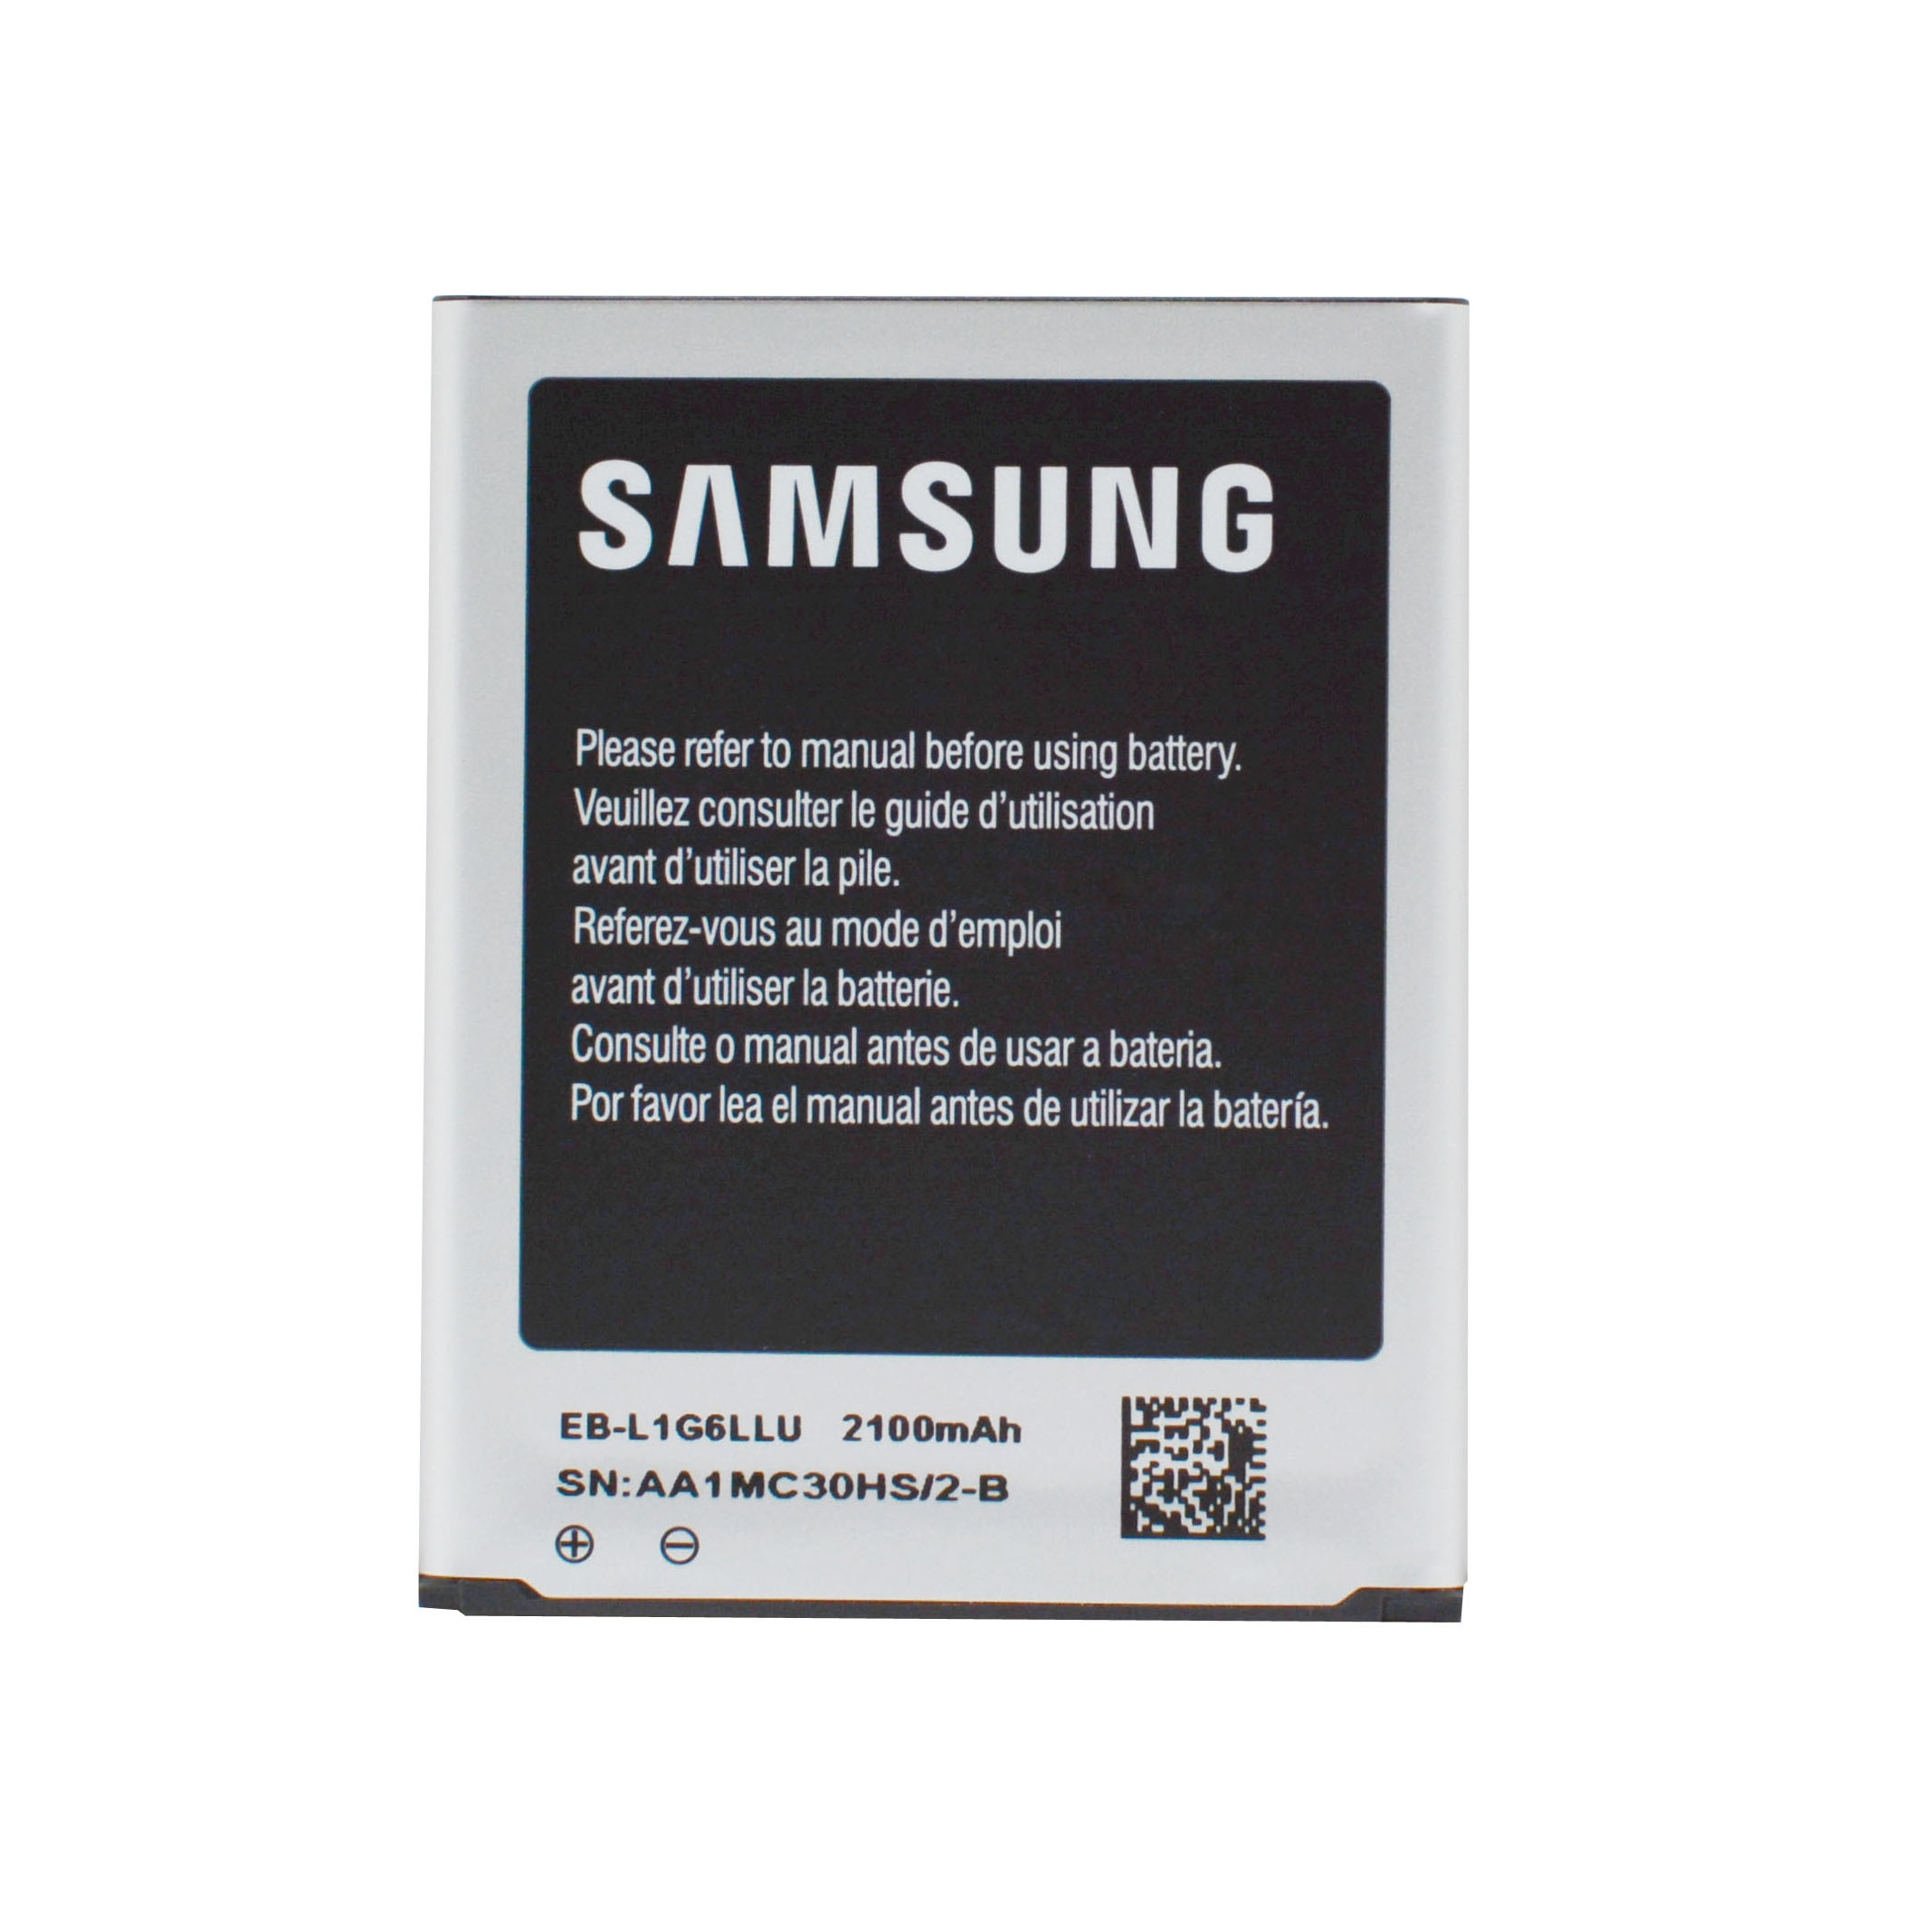 20pcs/lot Samsung S3 Battery EB-L1G6LLU For Galaxy S3 I9300 I9308 I535 L710 Phone Replacement Batteria akku 2100mAh enlarge